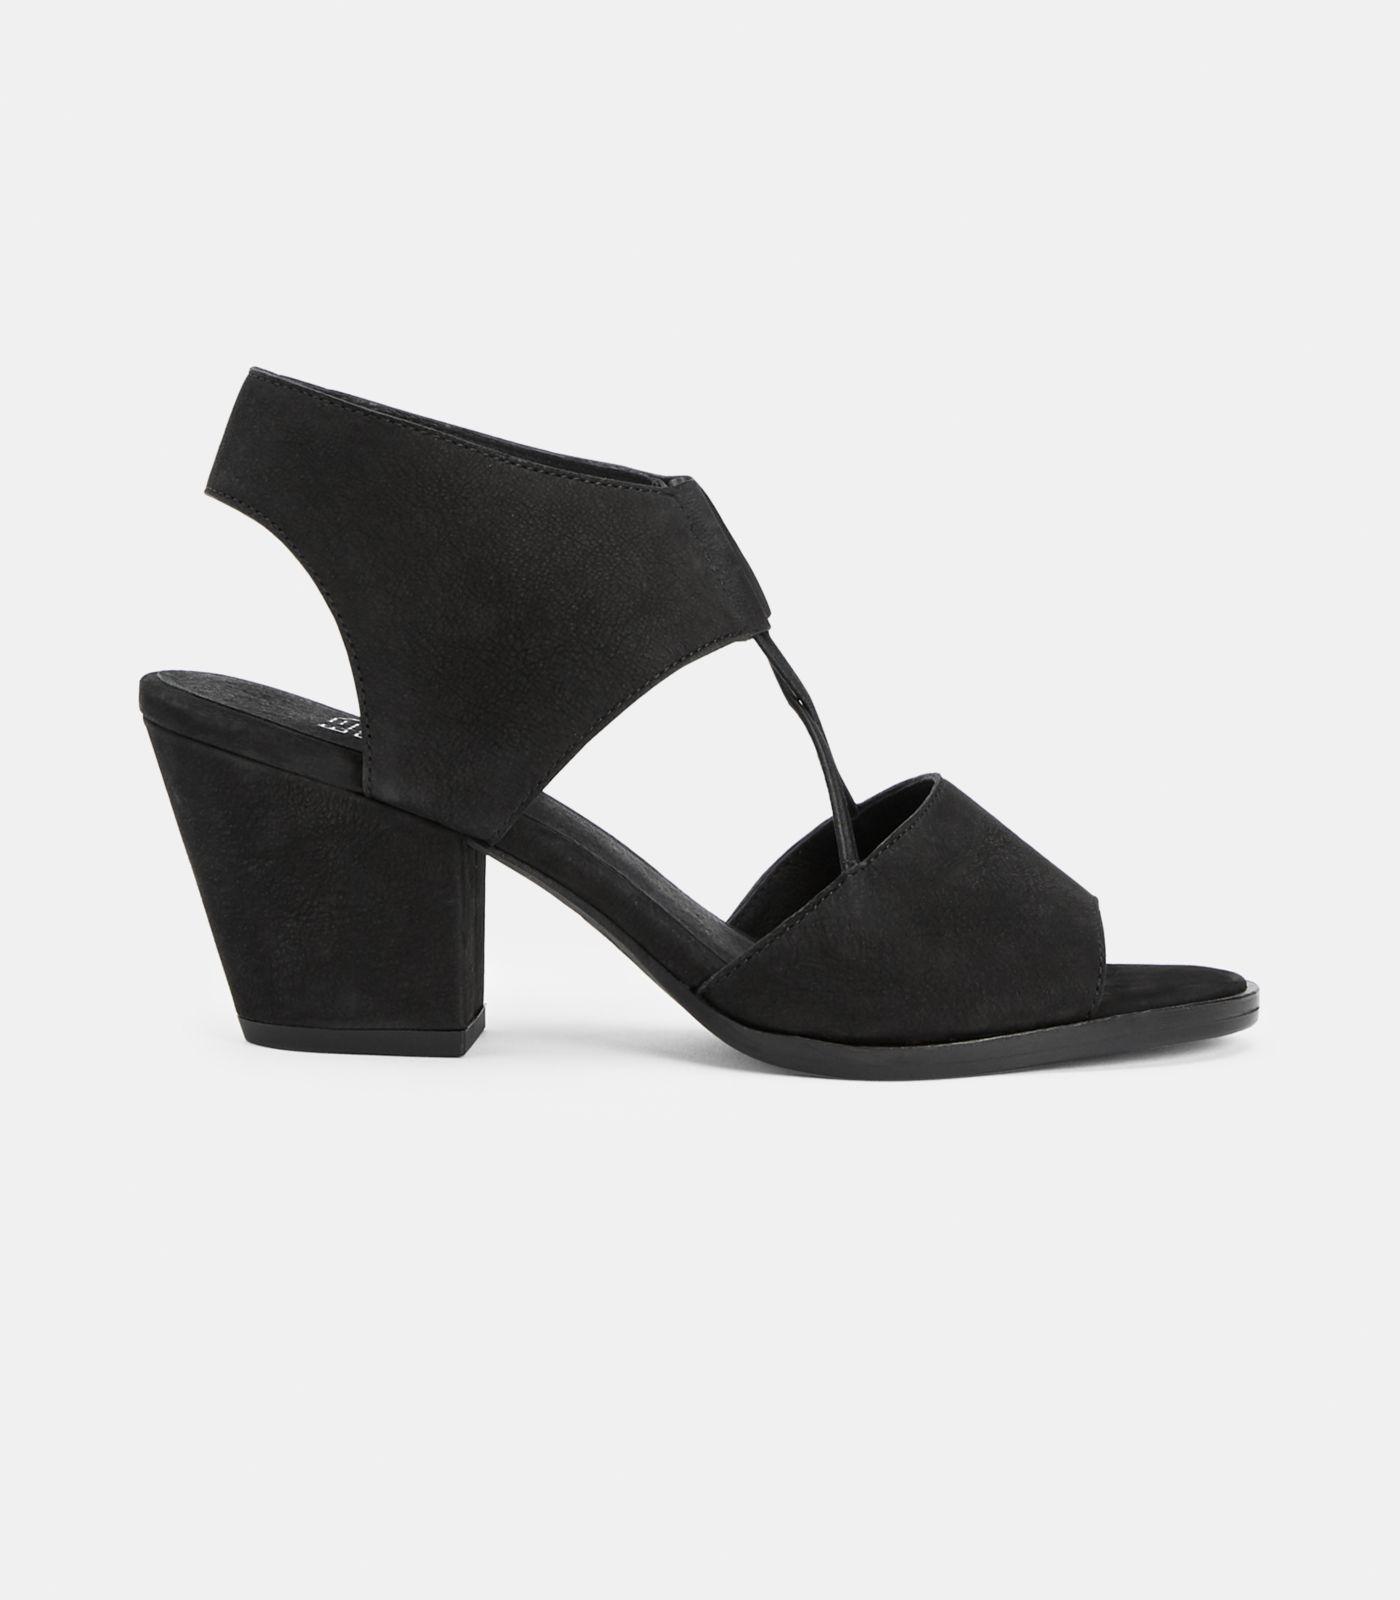 a4ee7cb21ba Lyst - Eileen Fisher Doe Tumbled Nubuck Sandal in Black